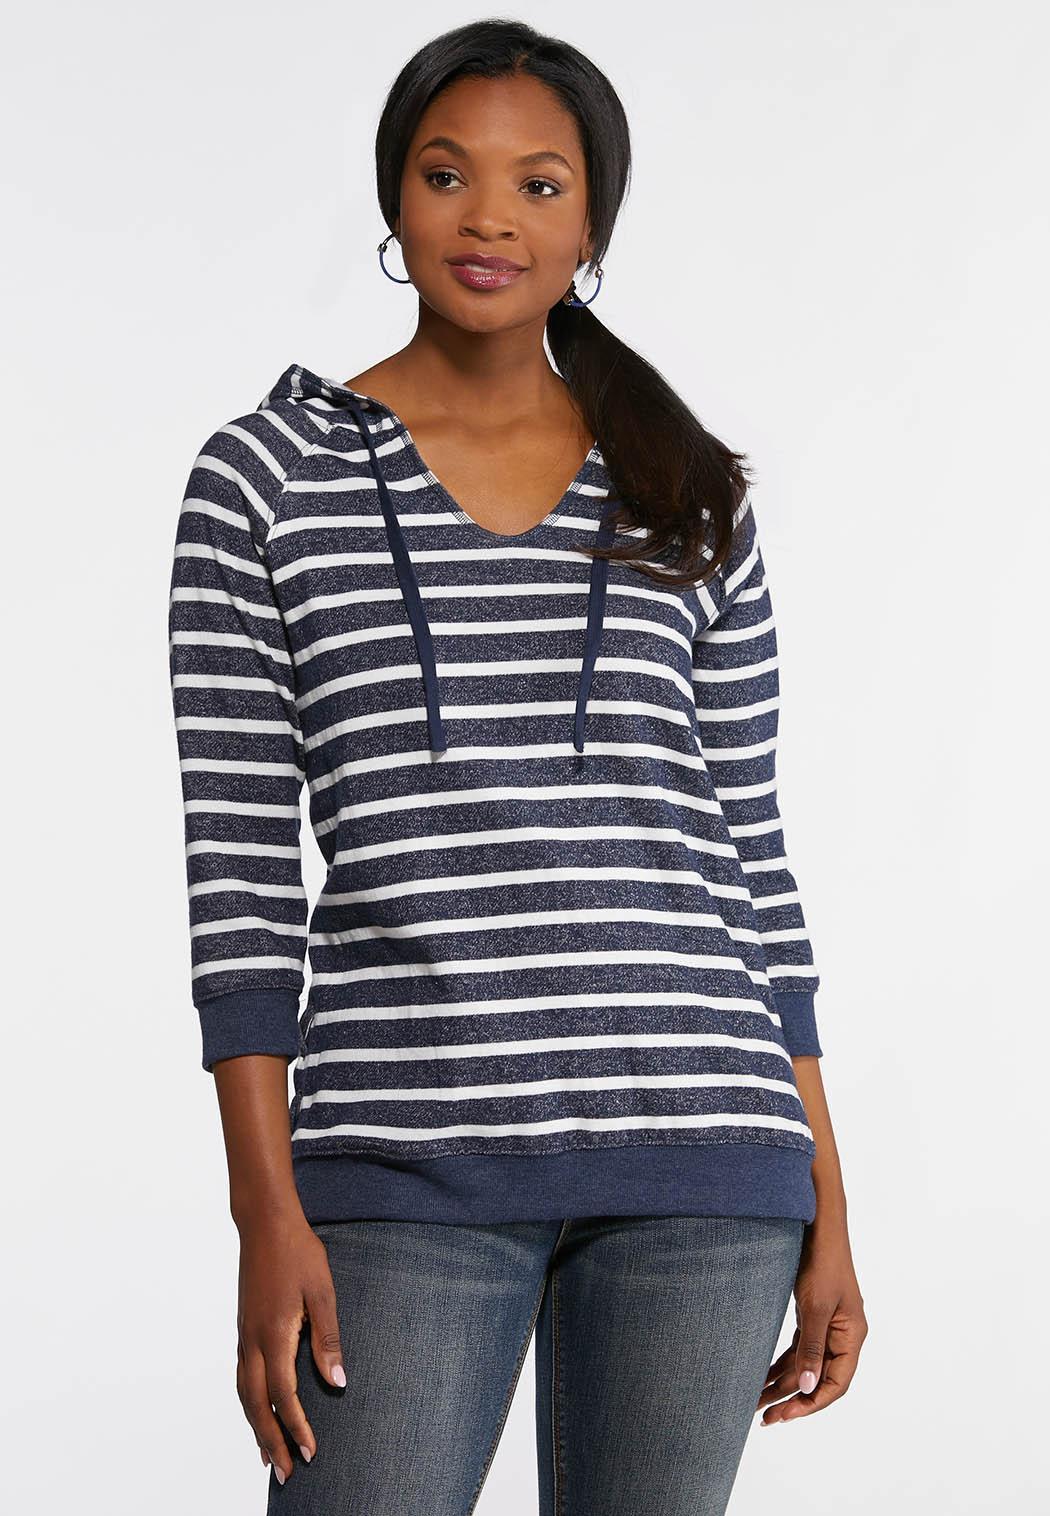 34fafb4da04fc Plus Size Striped Navy Fleece Hoodie Tops Cato Fashions